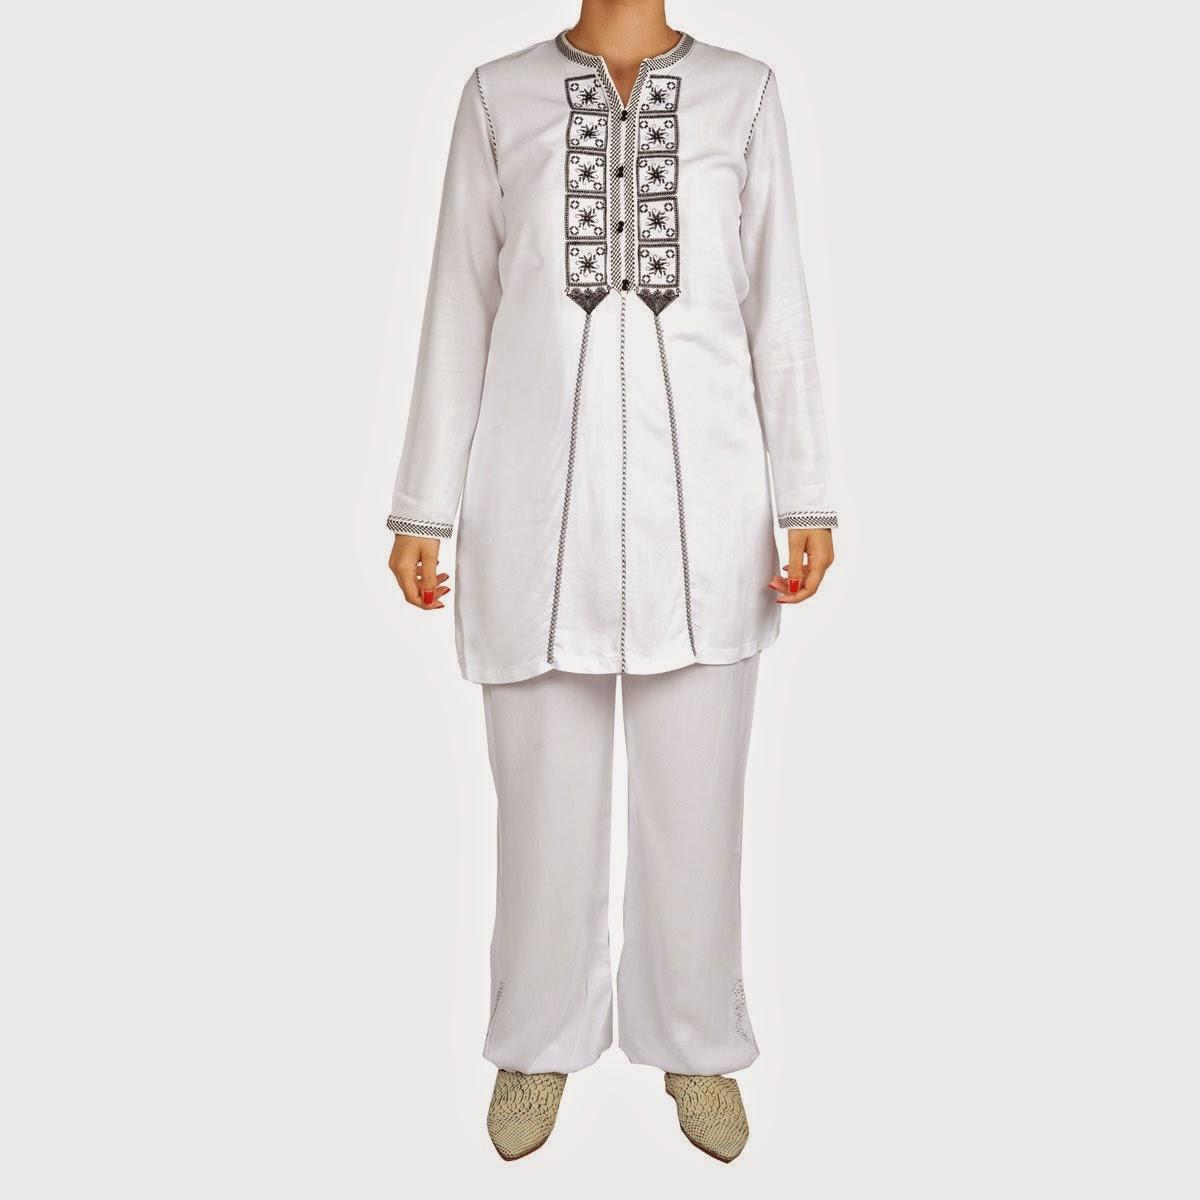 Jabador, Jabador femme, Jabador luxe, Jabador Marocain, jabador moderne, Jabador blanc, jabador blanche,